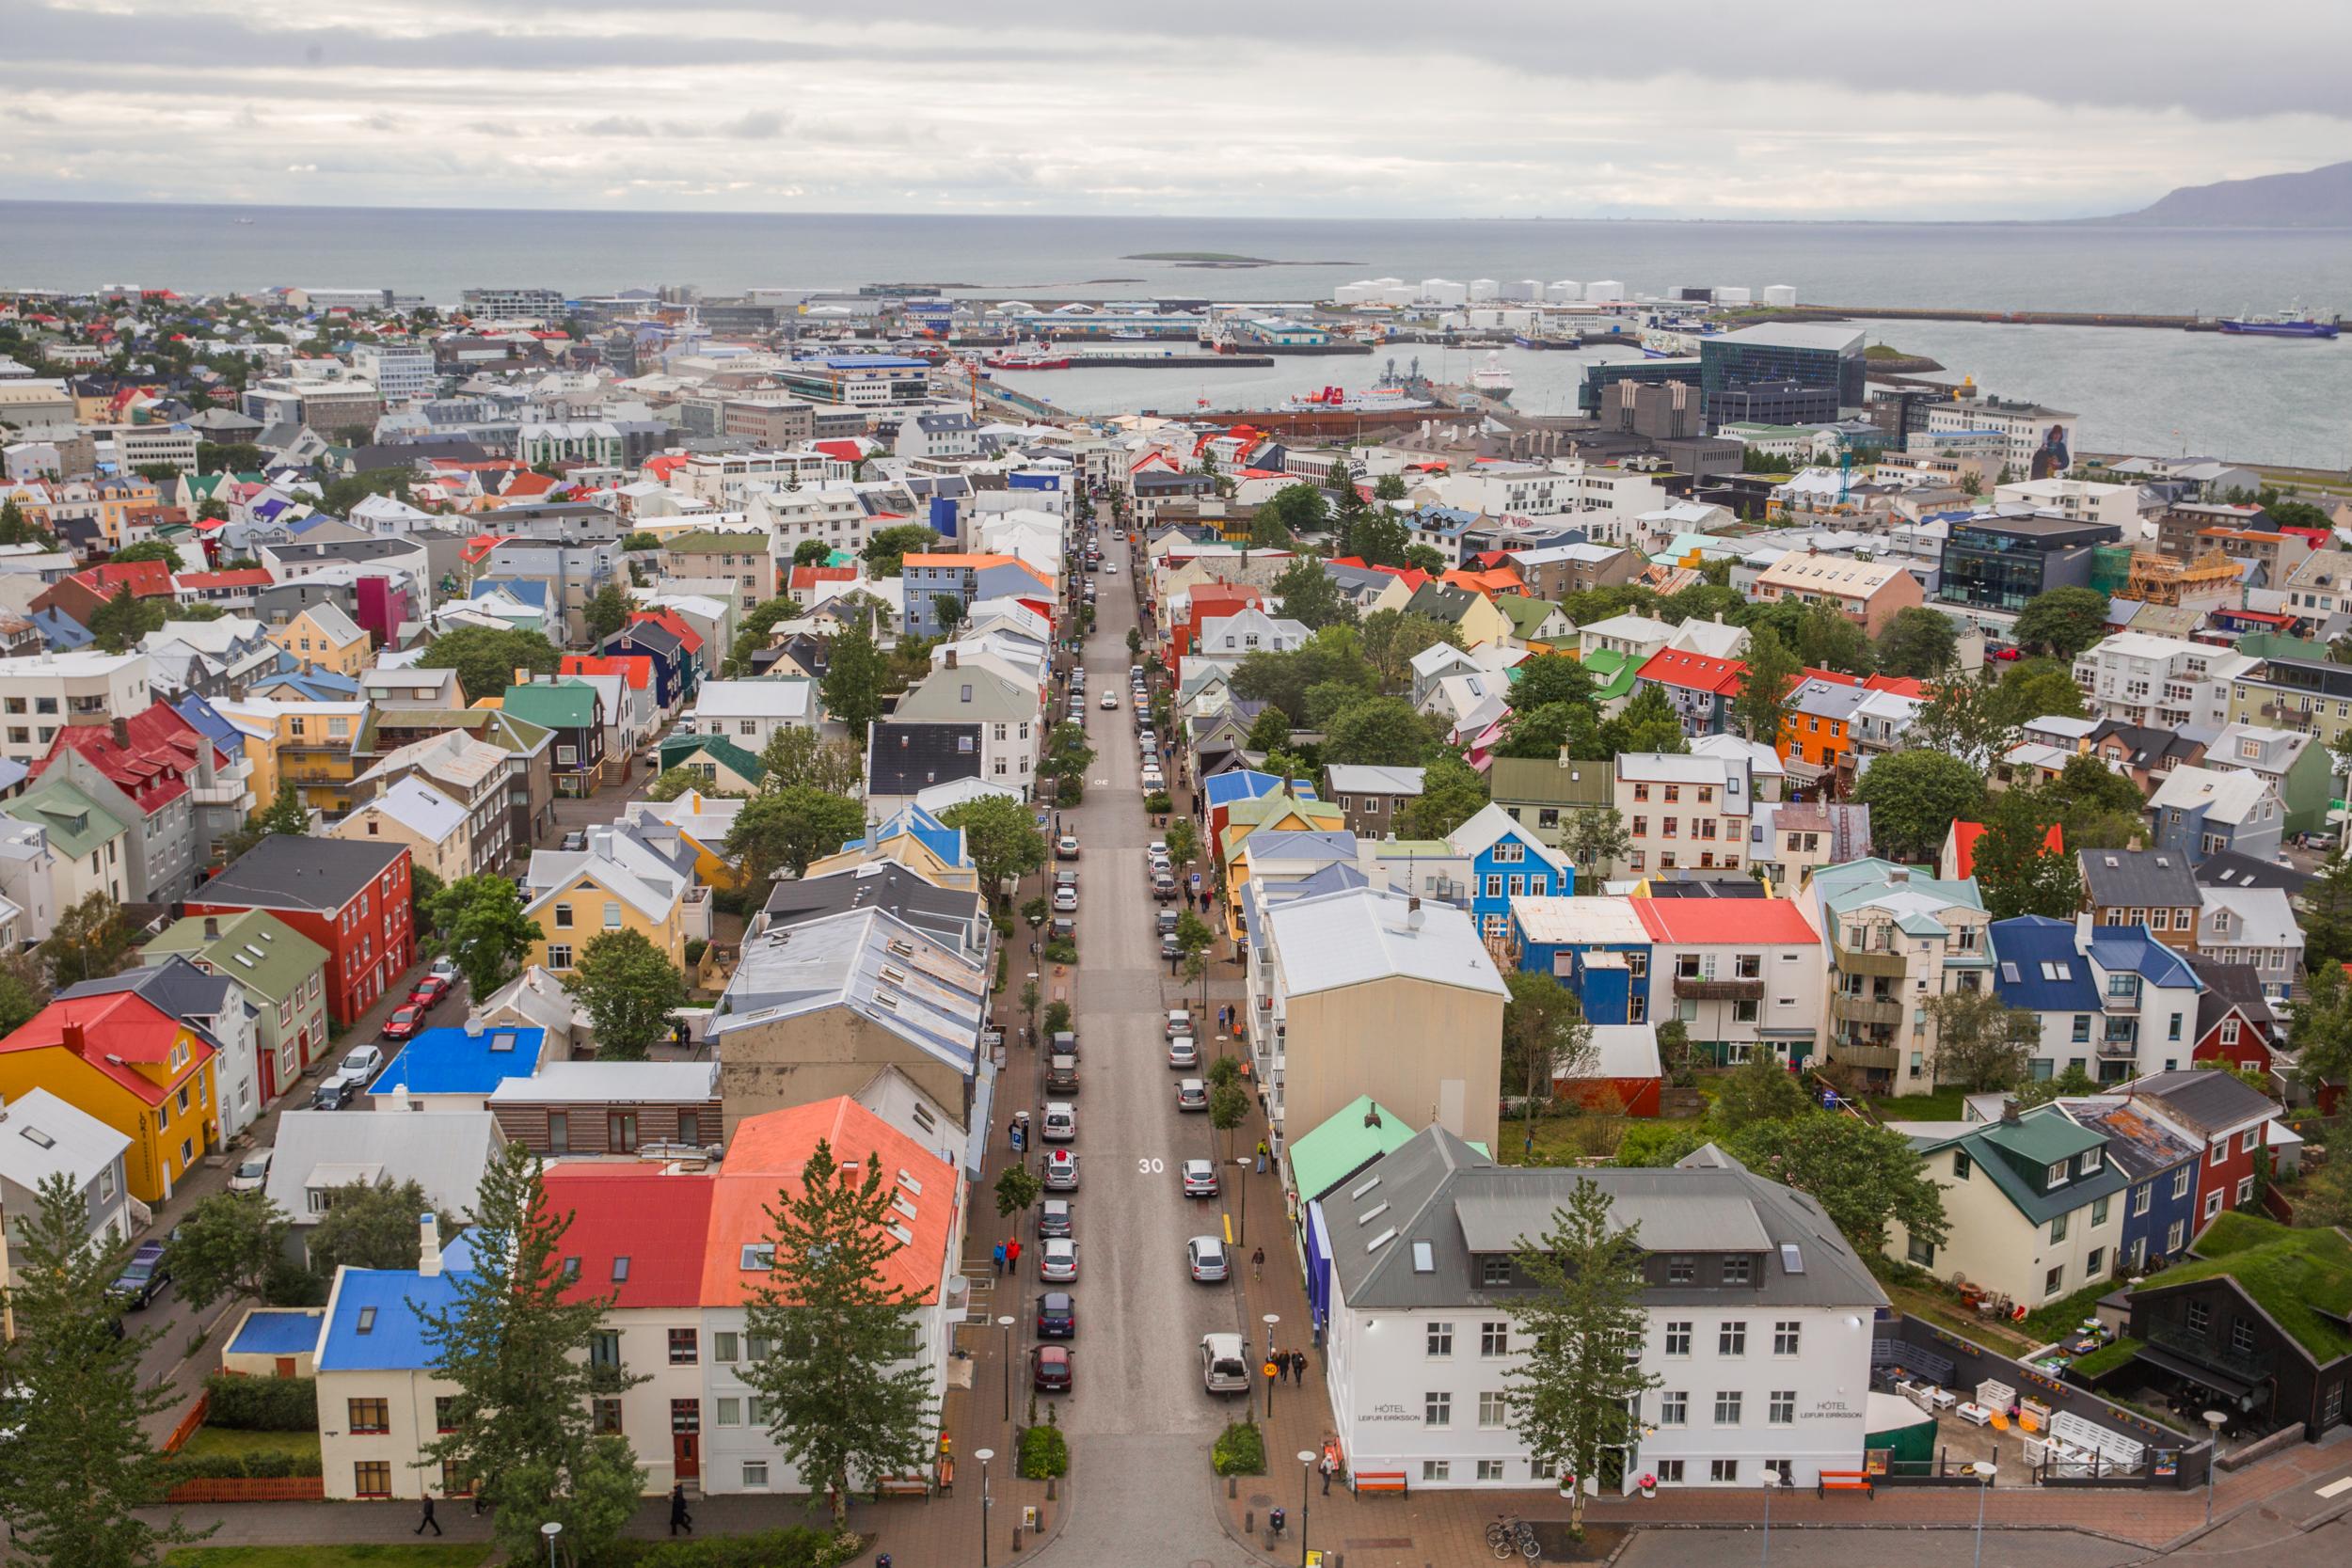 Iceland-160628-94